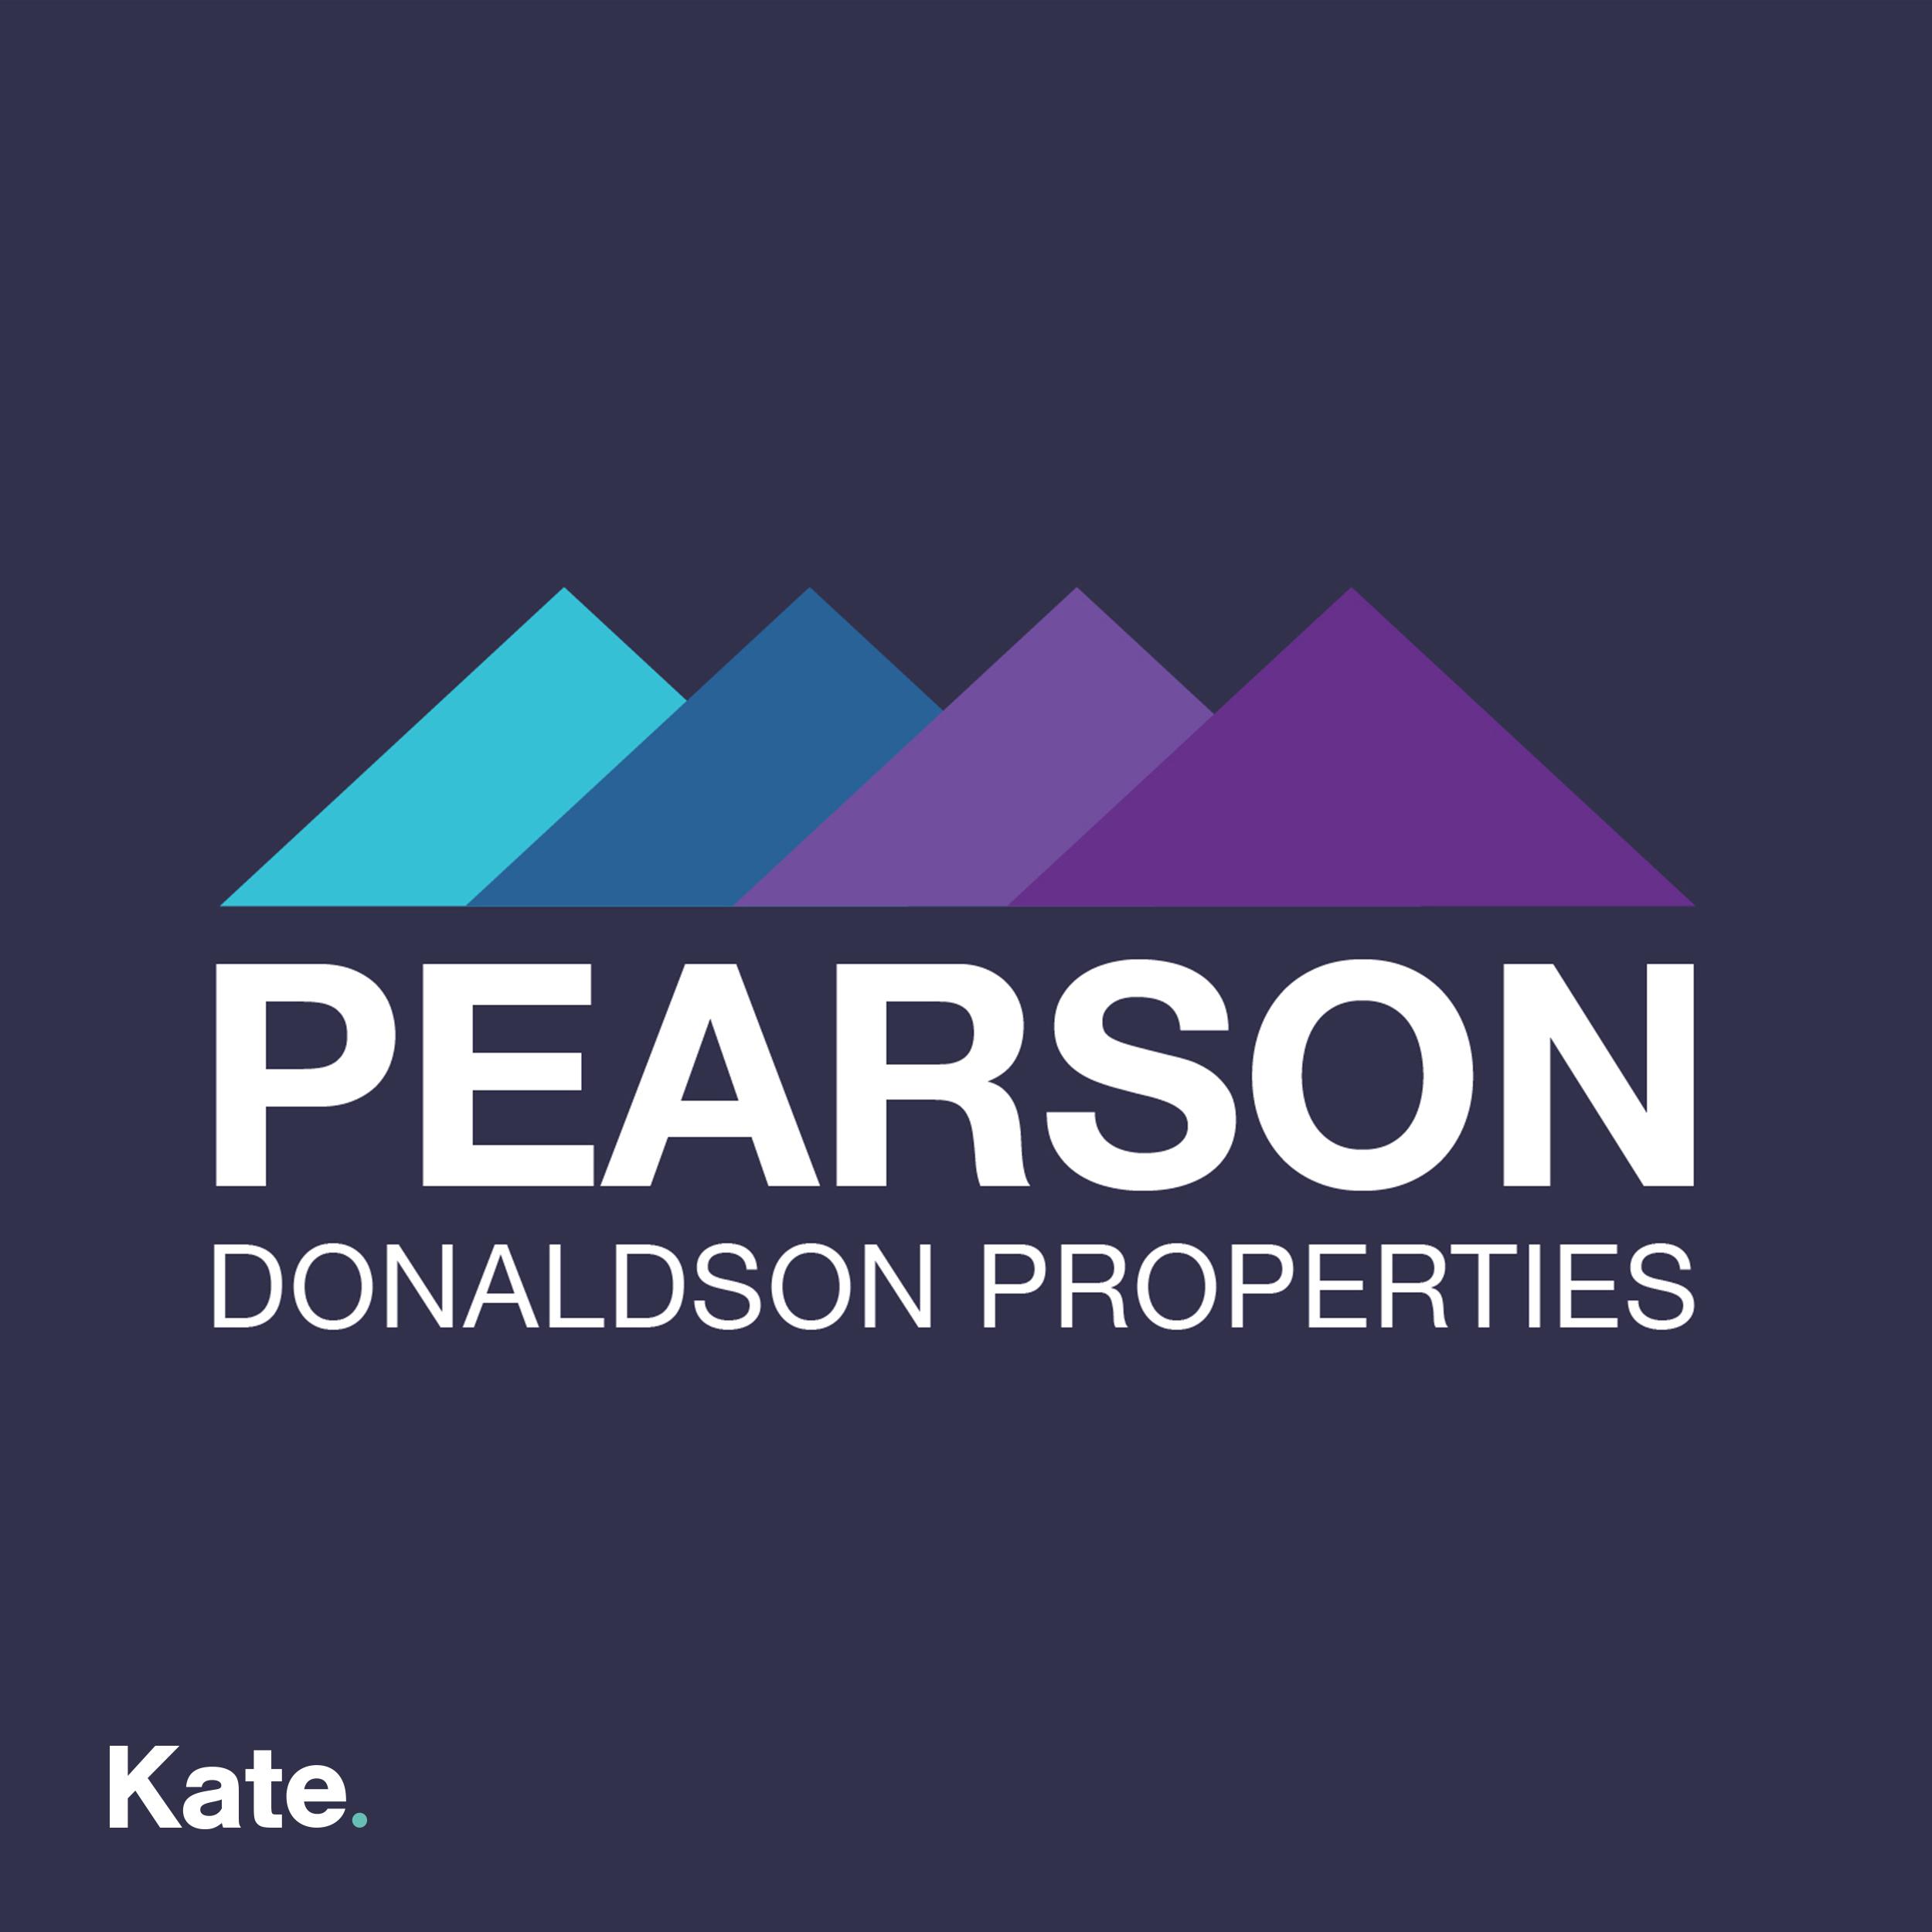 Pearson Donaldson Properties Logo